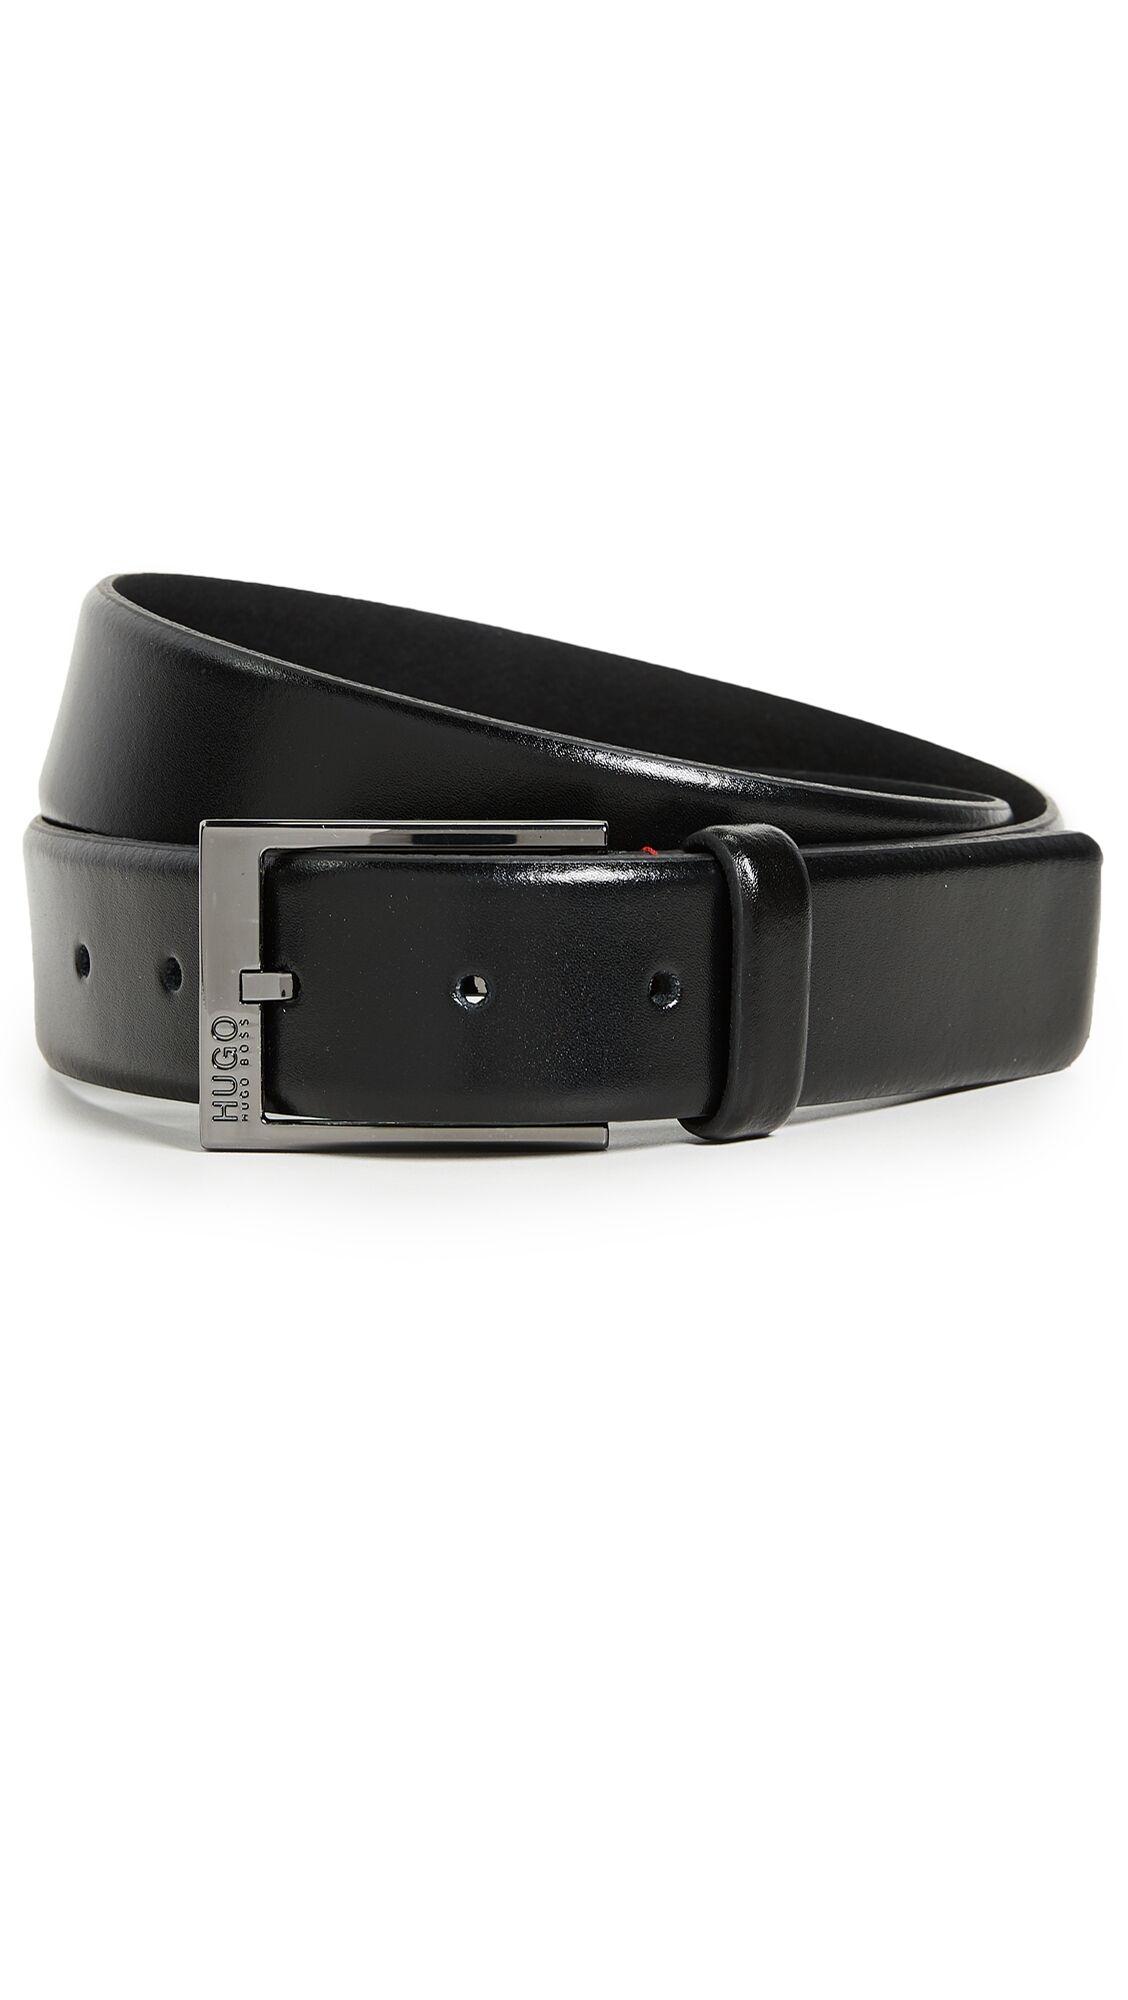 Hugo Boss Garney Smooth Leather Belt - Black - Size: 32